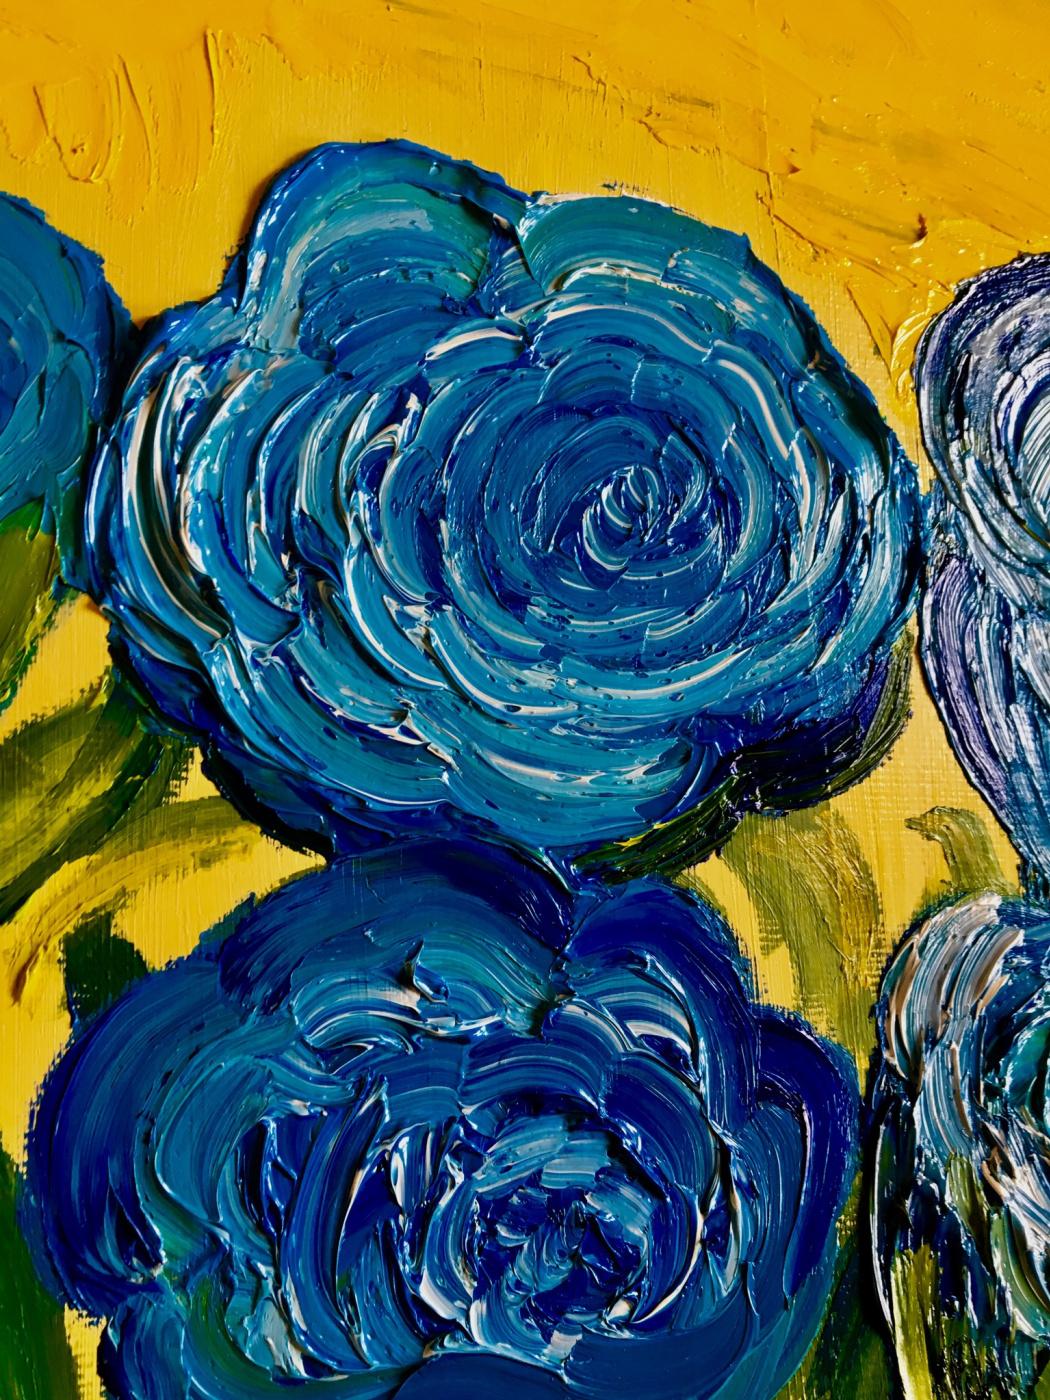 Blooming blue roses